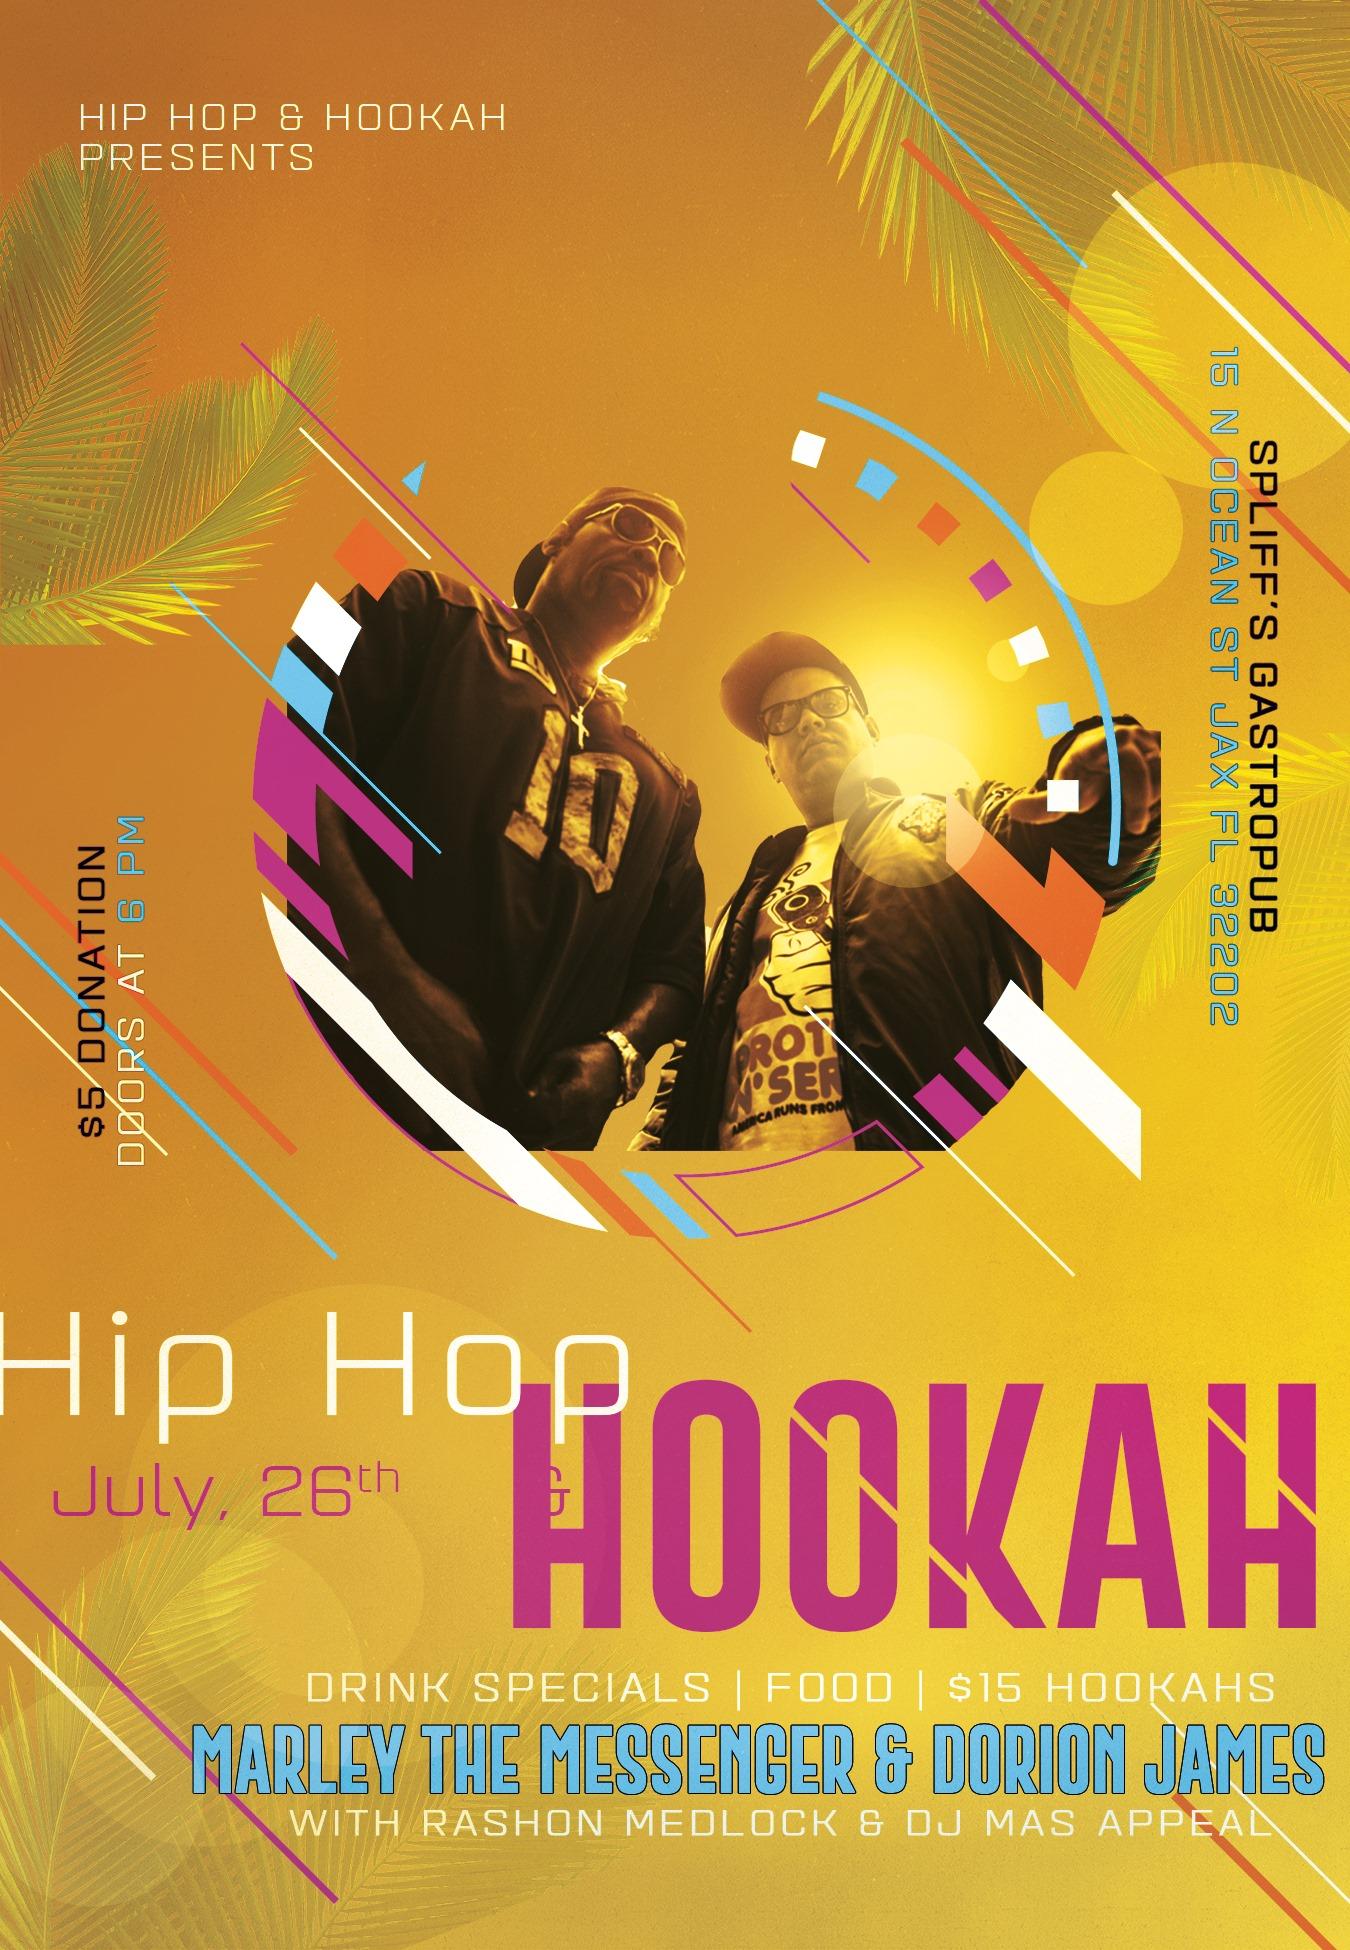 Hip Hop & Hookah